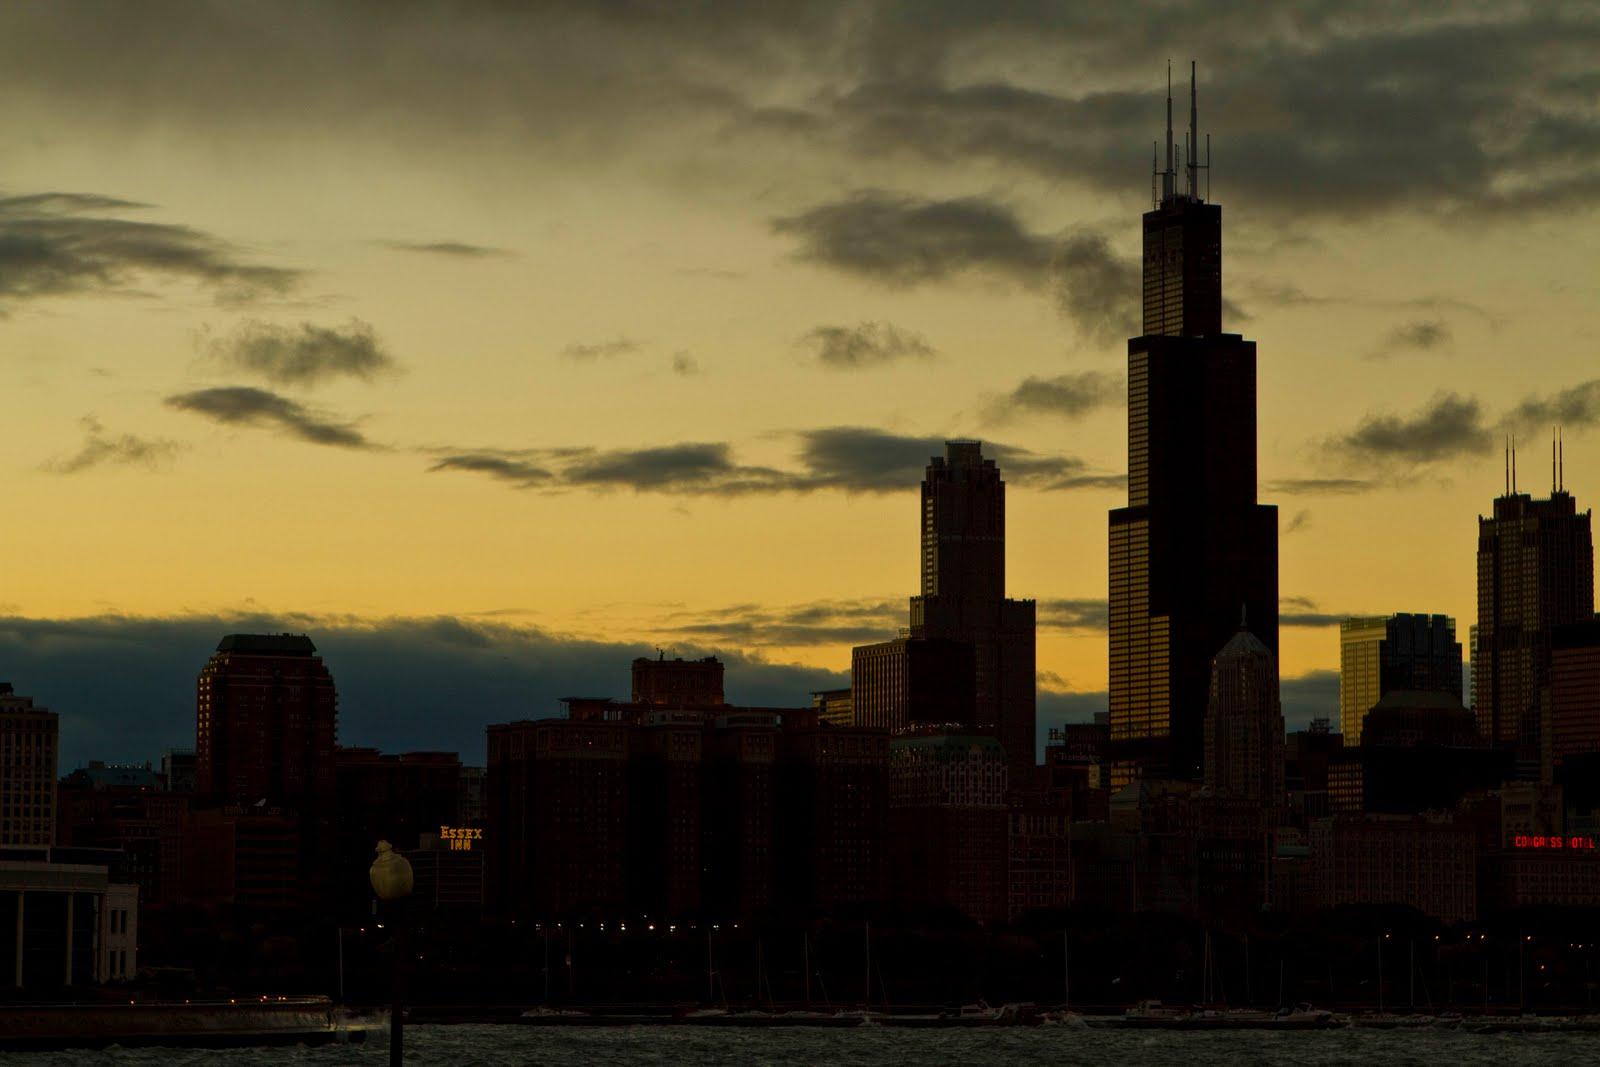 Photograbbers chicago landscape for Chicago landscape